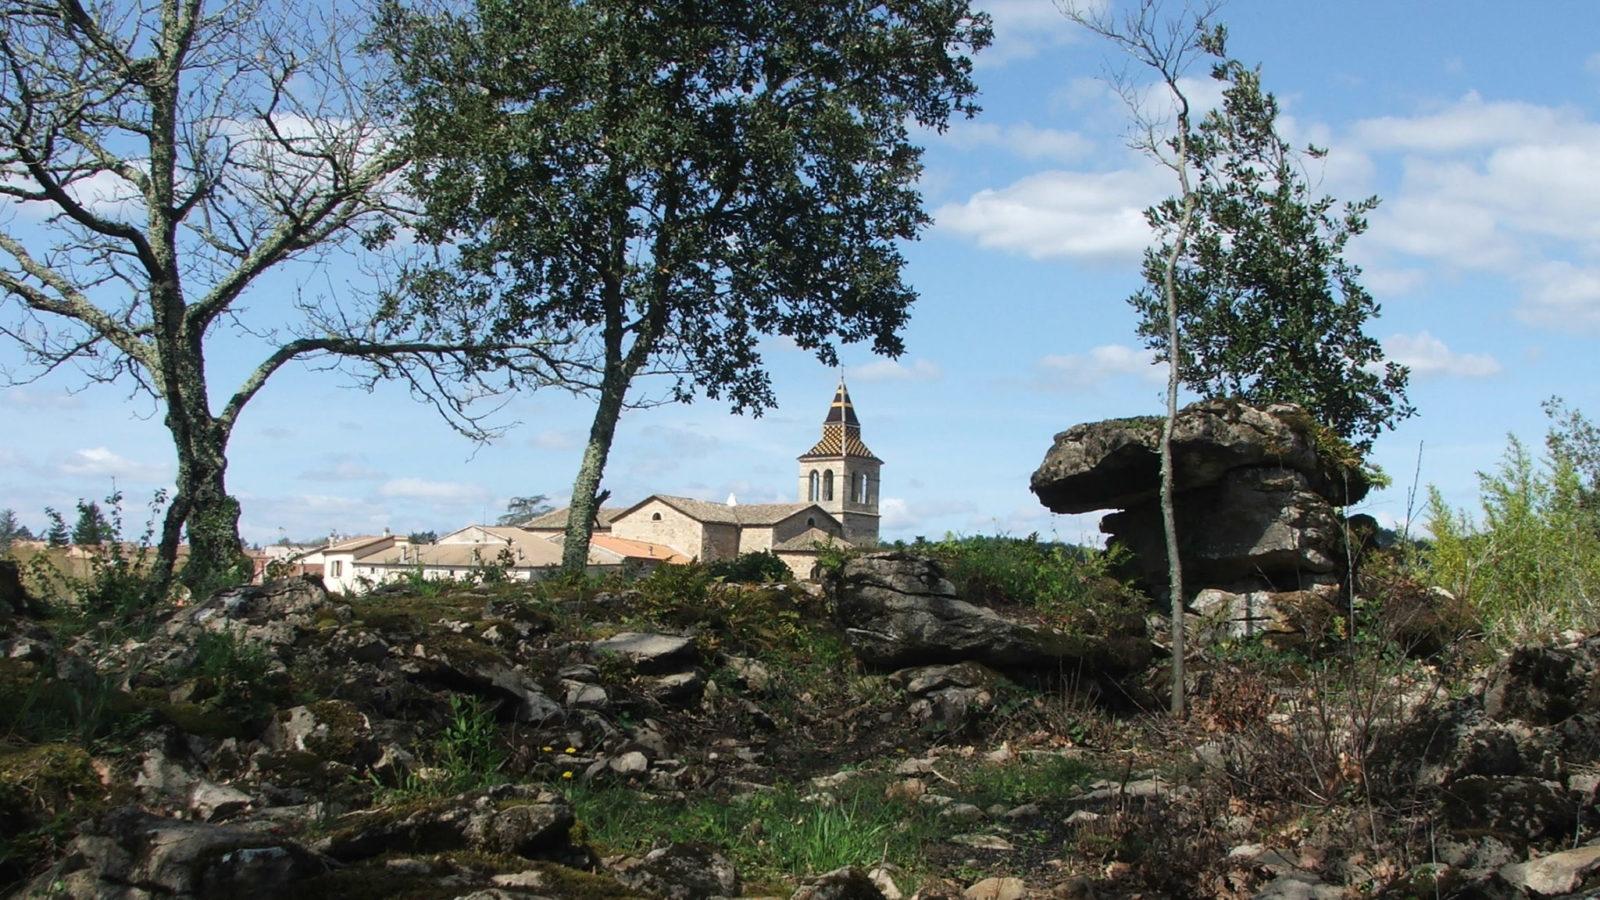 Laurac-en-Vivarais and the water circuit